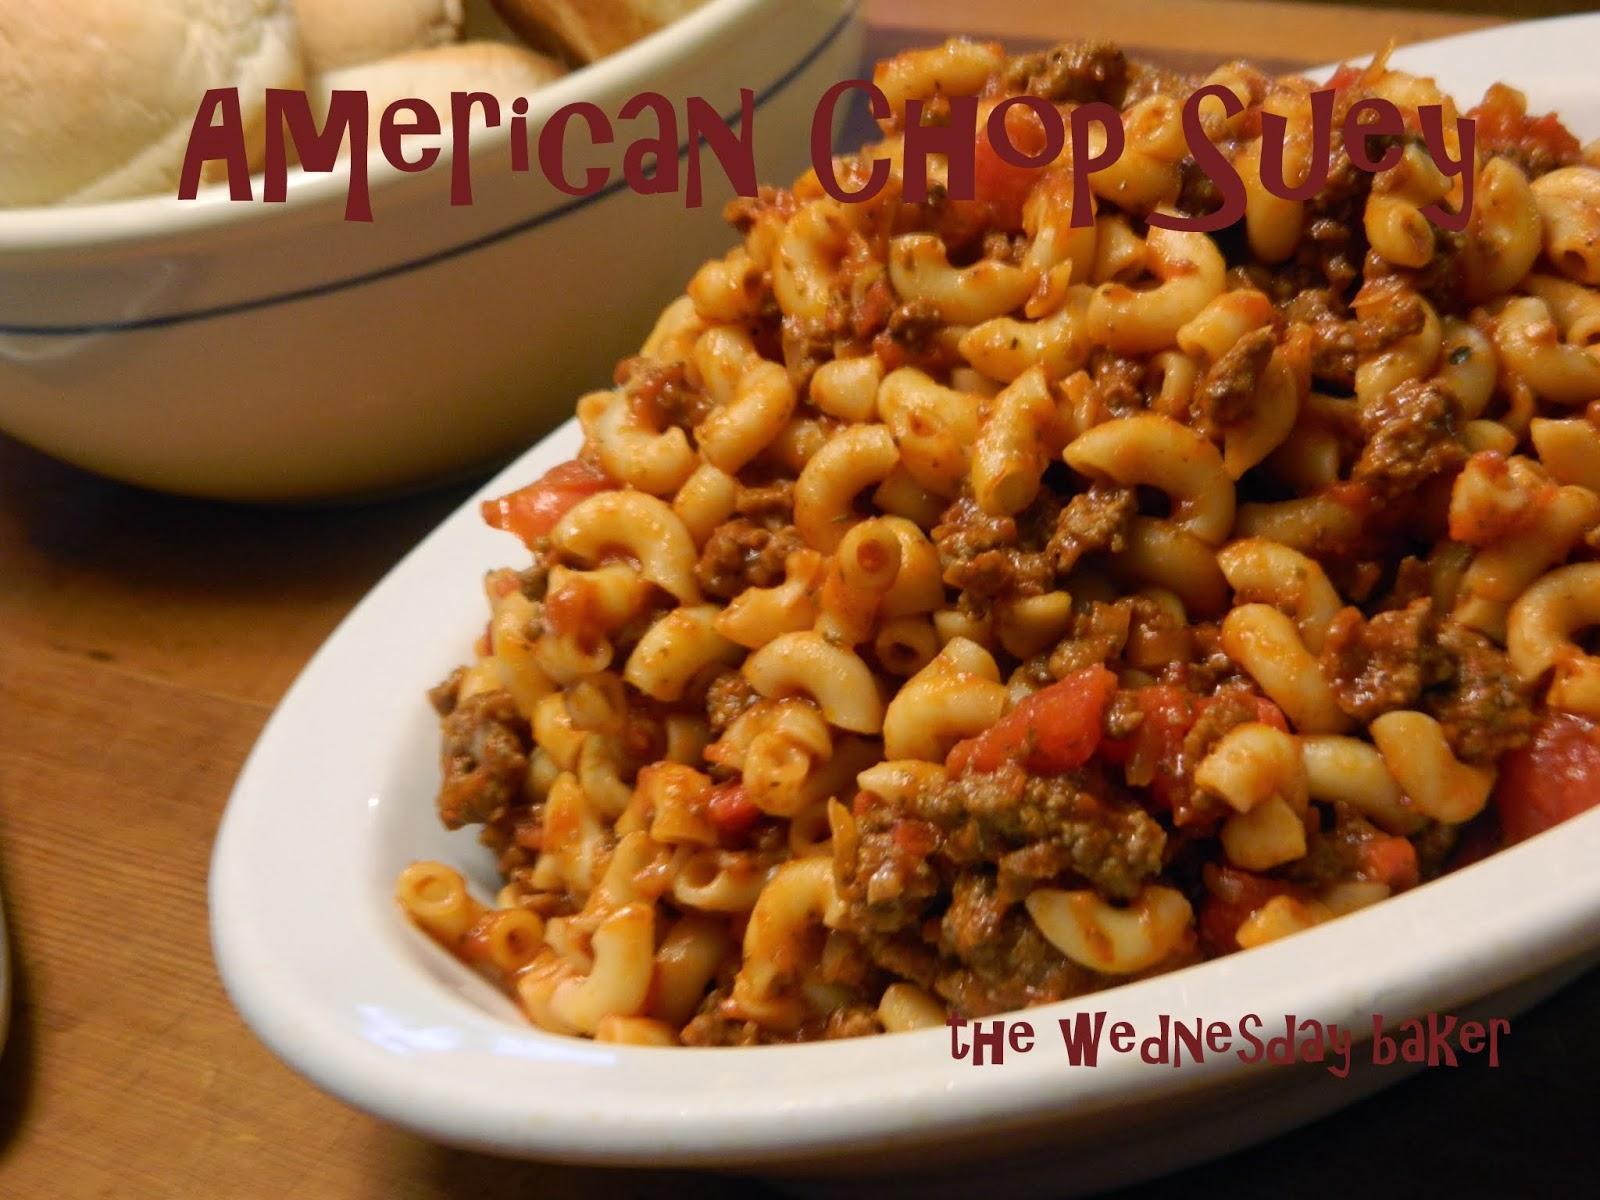 The Wednesday Baker: AMERICAN CHOP SUEY